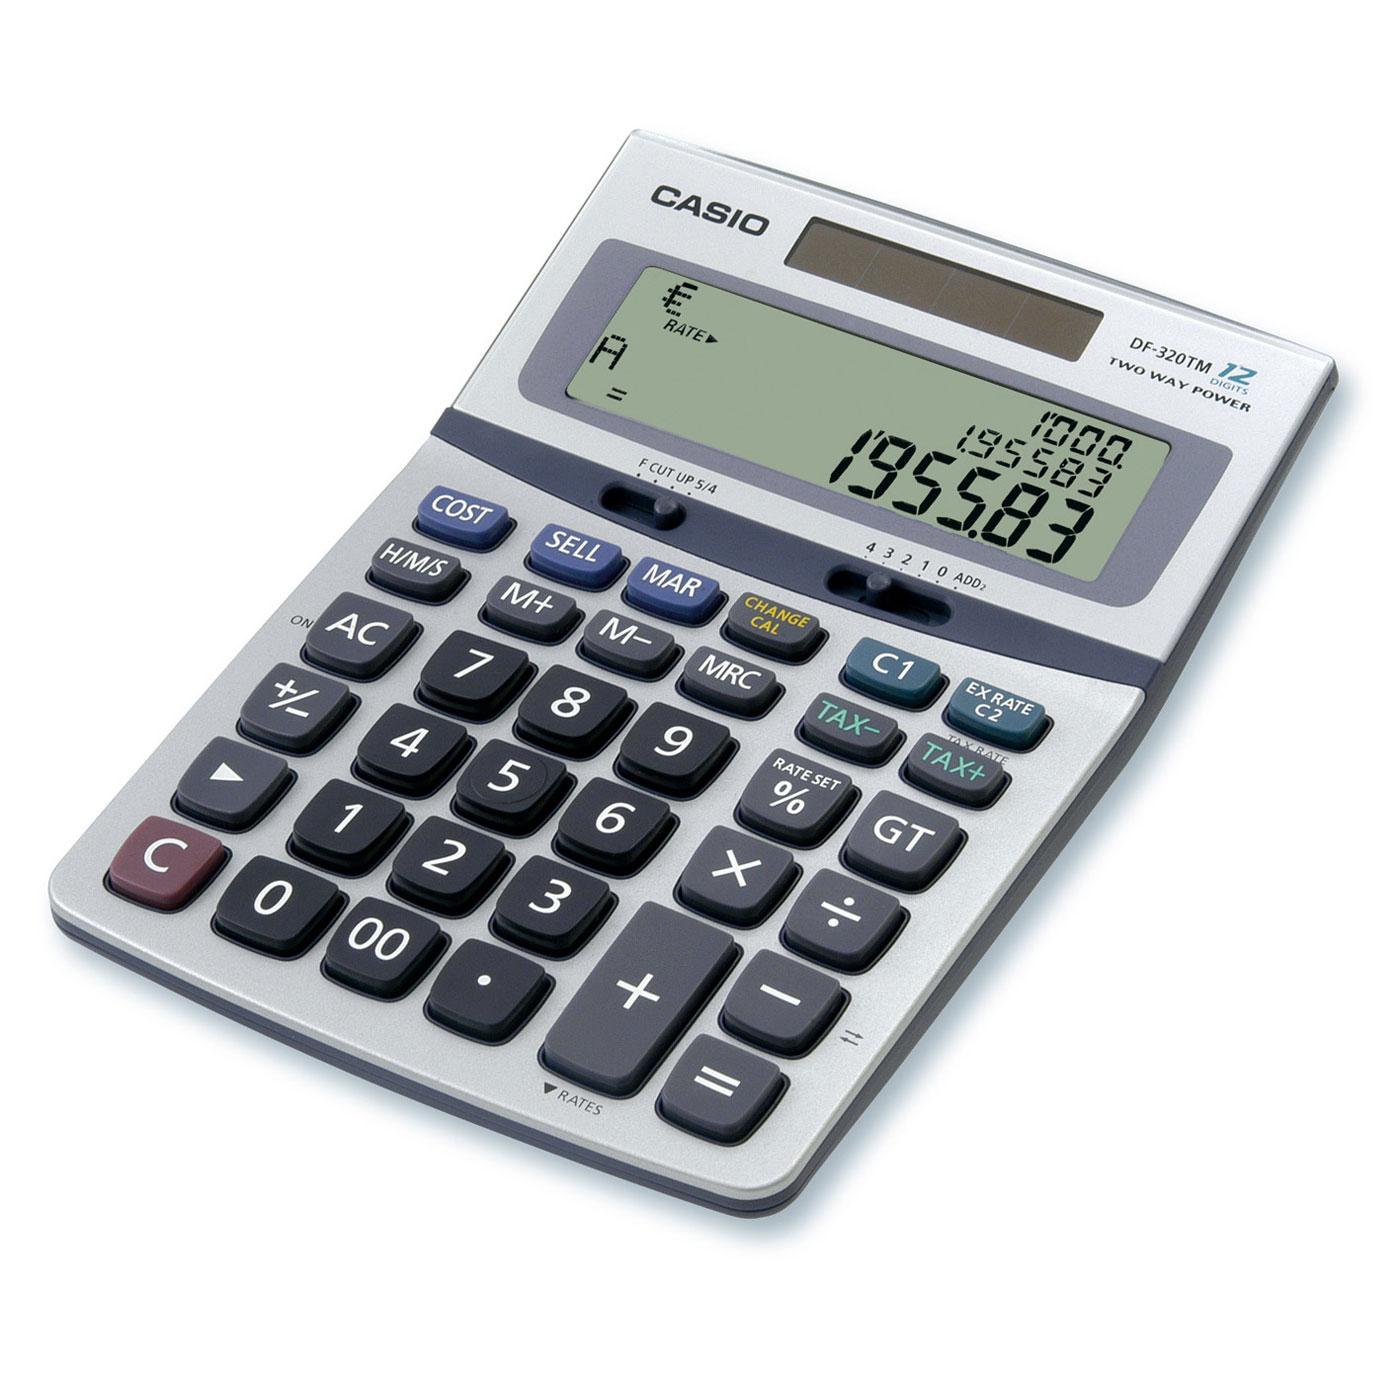 casio df 320tm calculatrice de bureau calculatrice casio sur ldlc. Black Bedroom Furniture Sets. Home Design Ideas